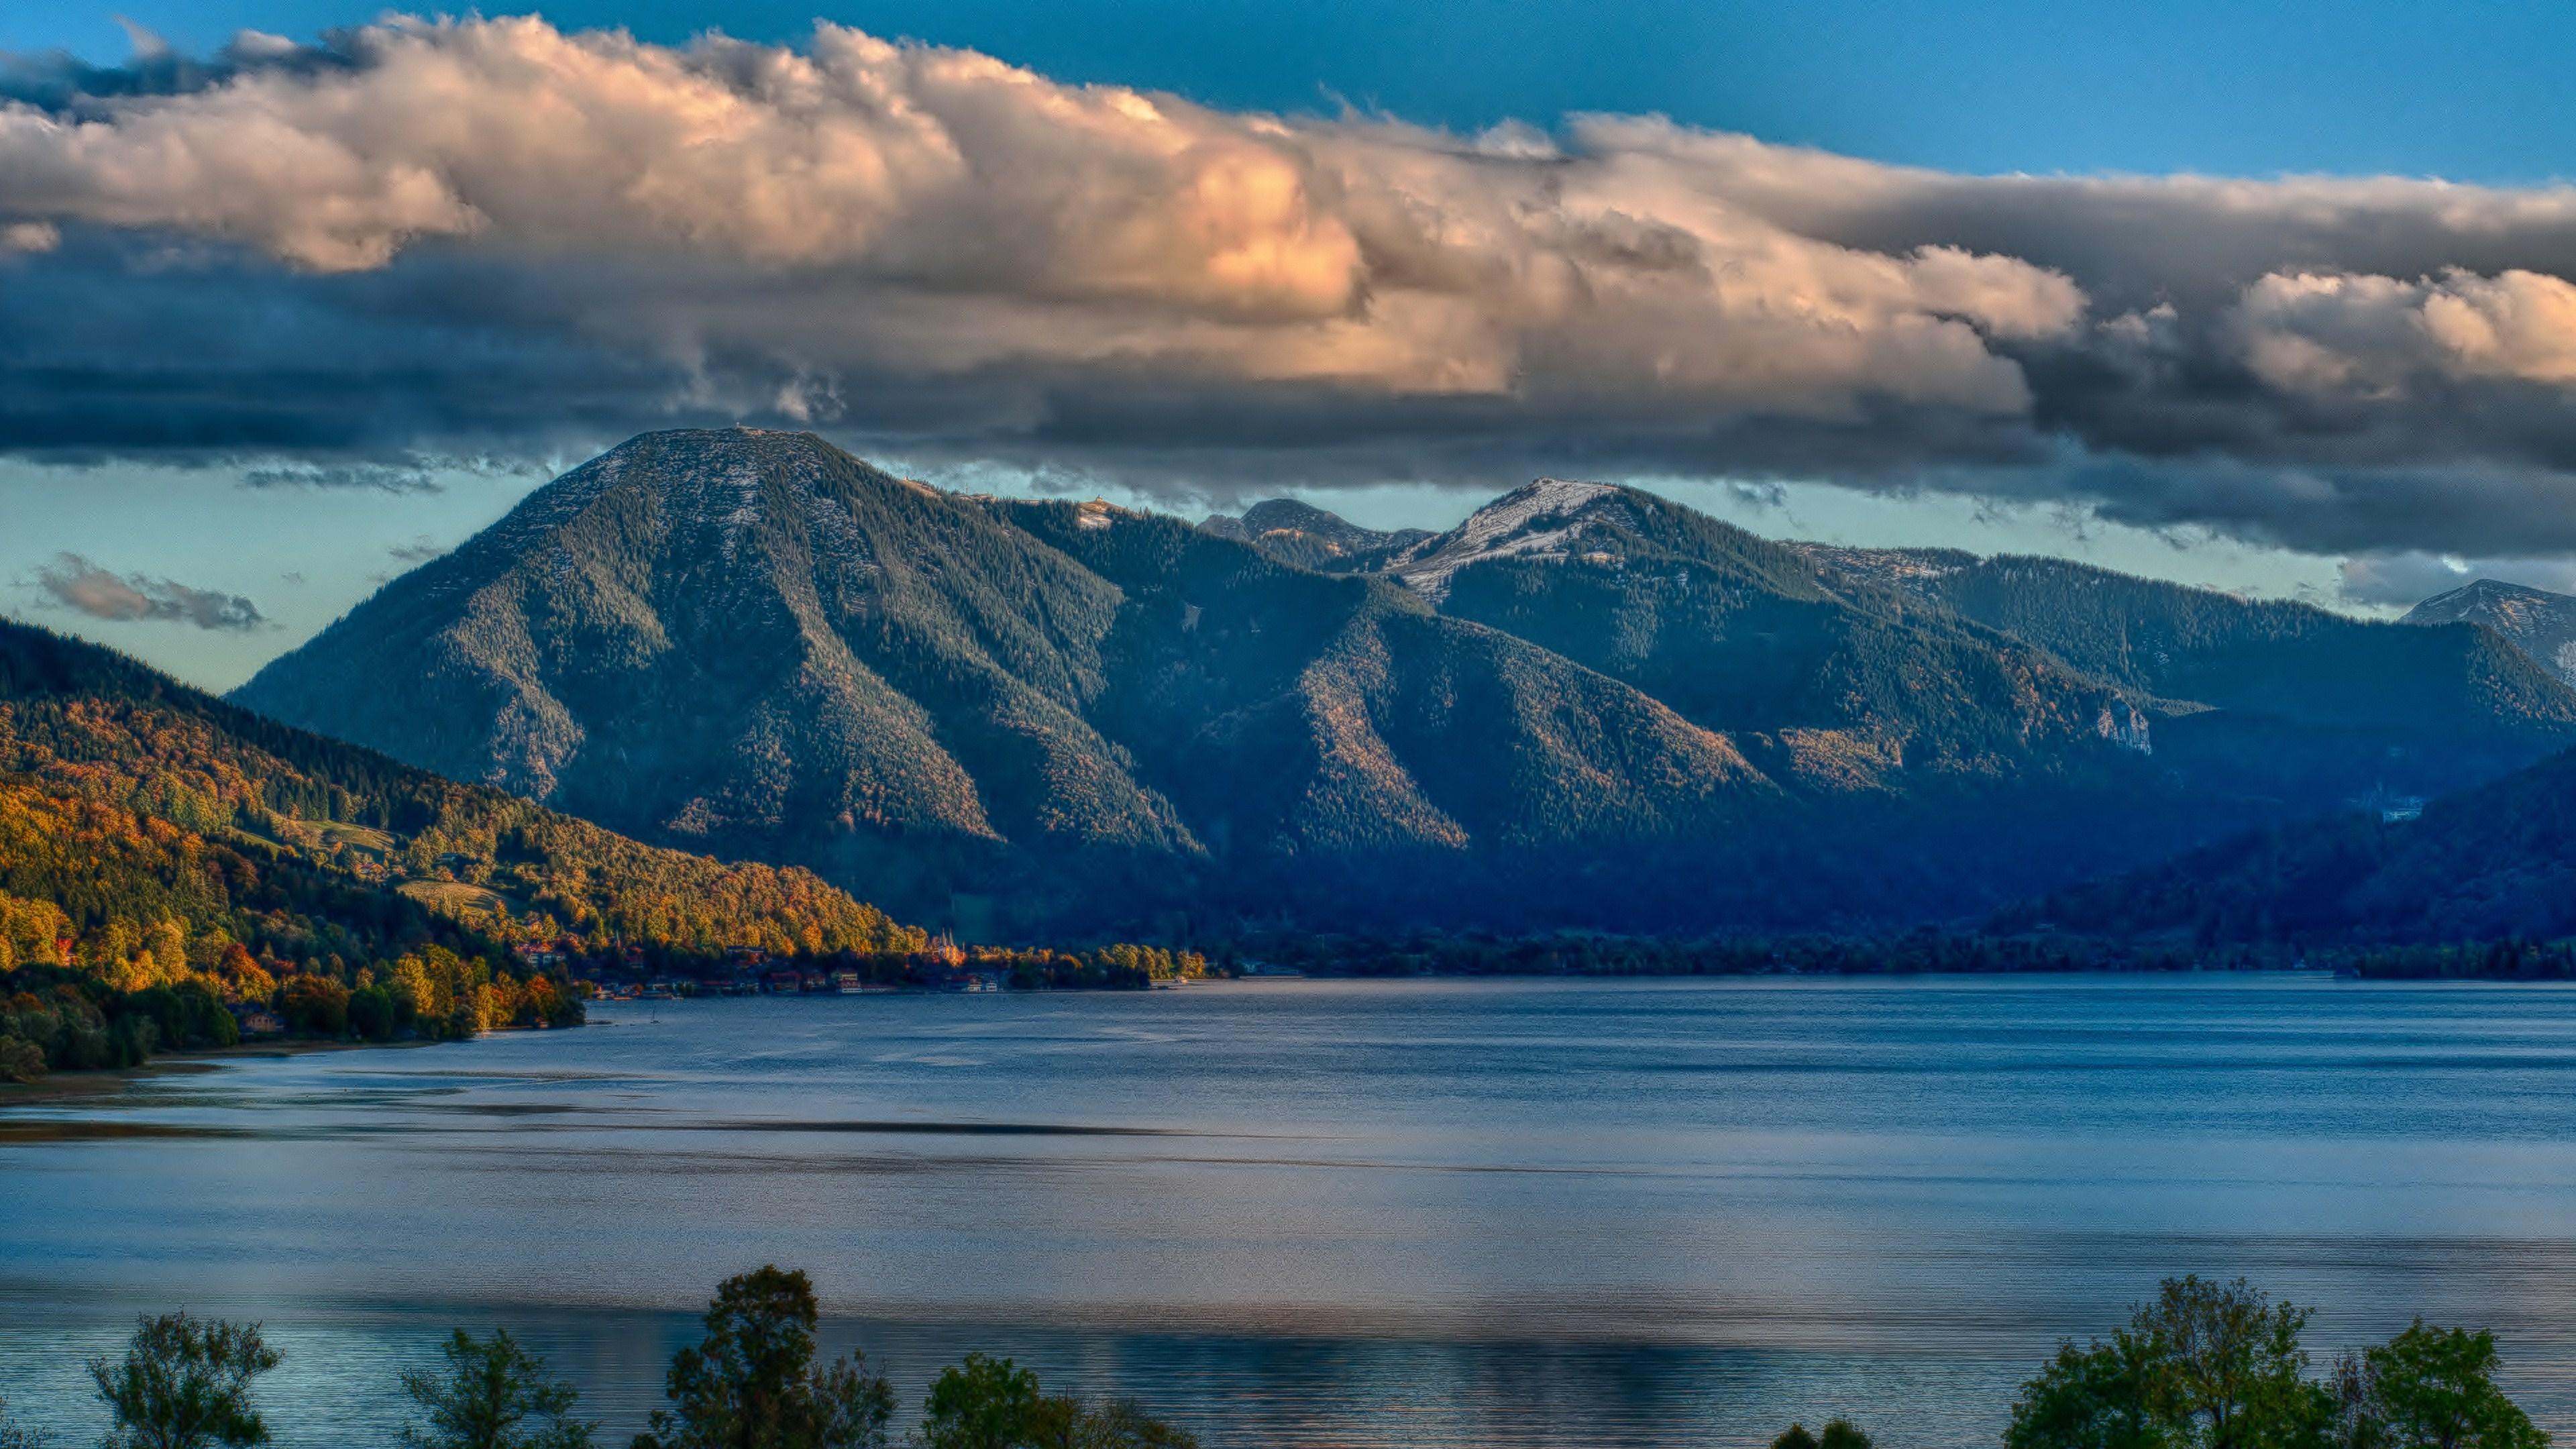 Nature Lake Landscape Reflection Fog Ultrahd 4k Wallpaper